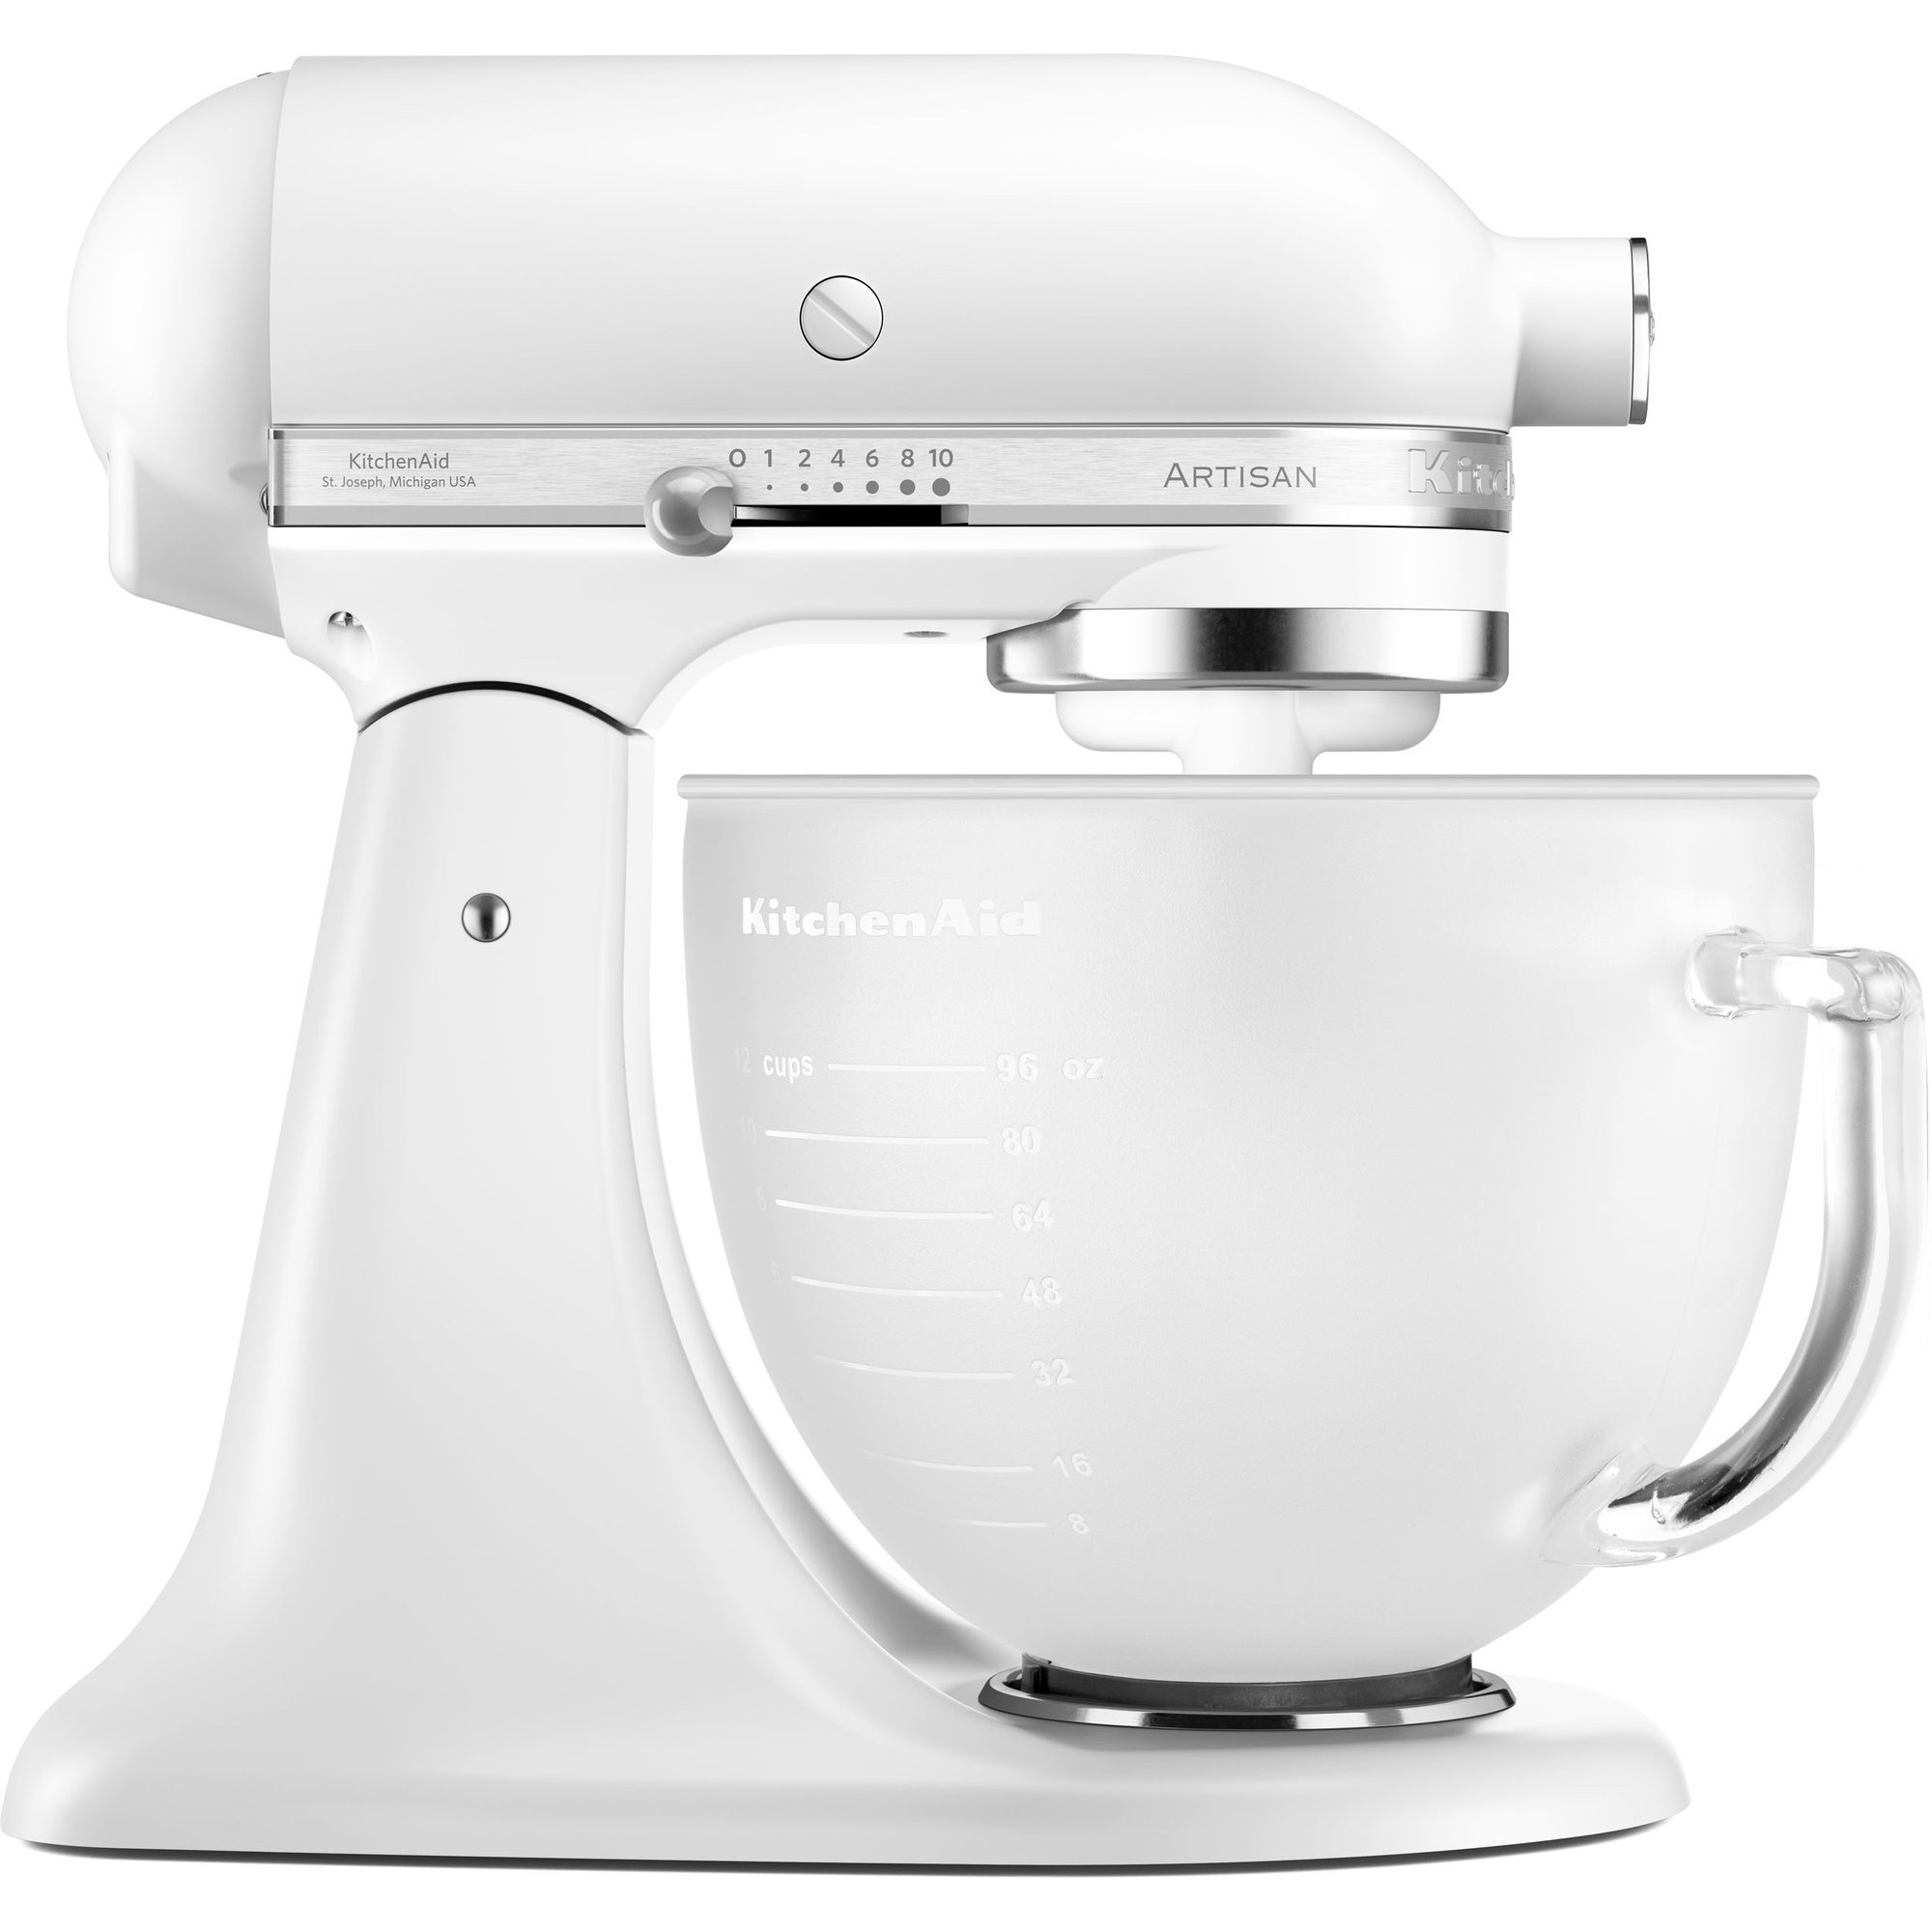 KitchenAid Artisan KSM156PSEFP köksmaskin vit + matt skål